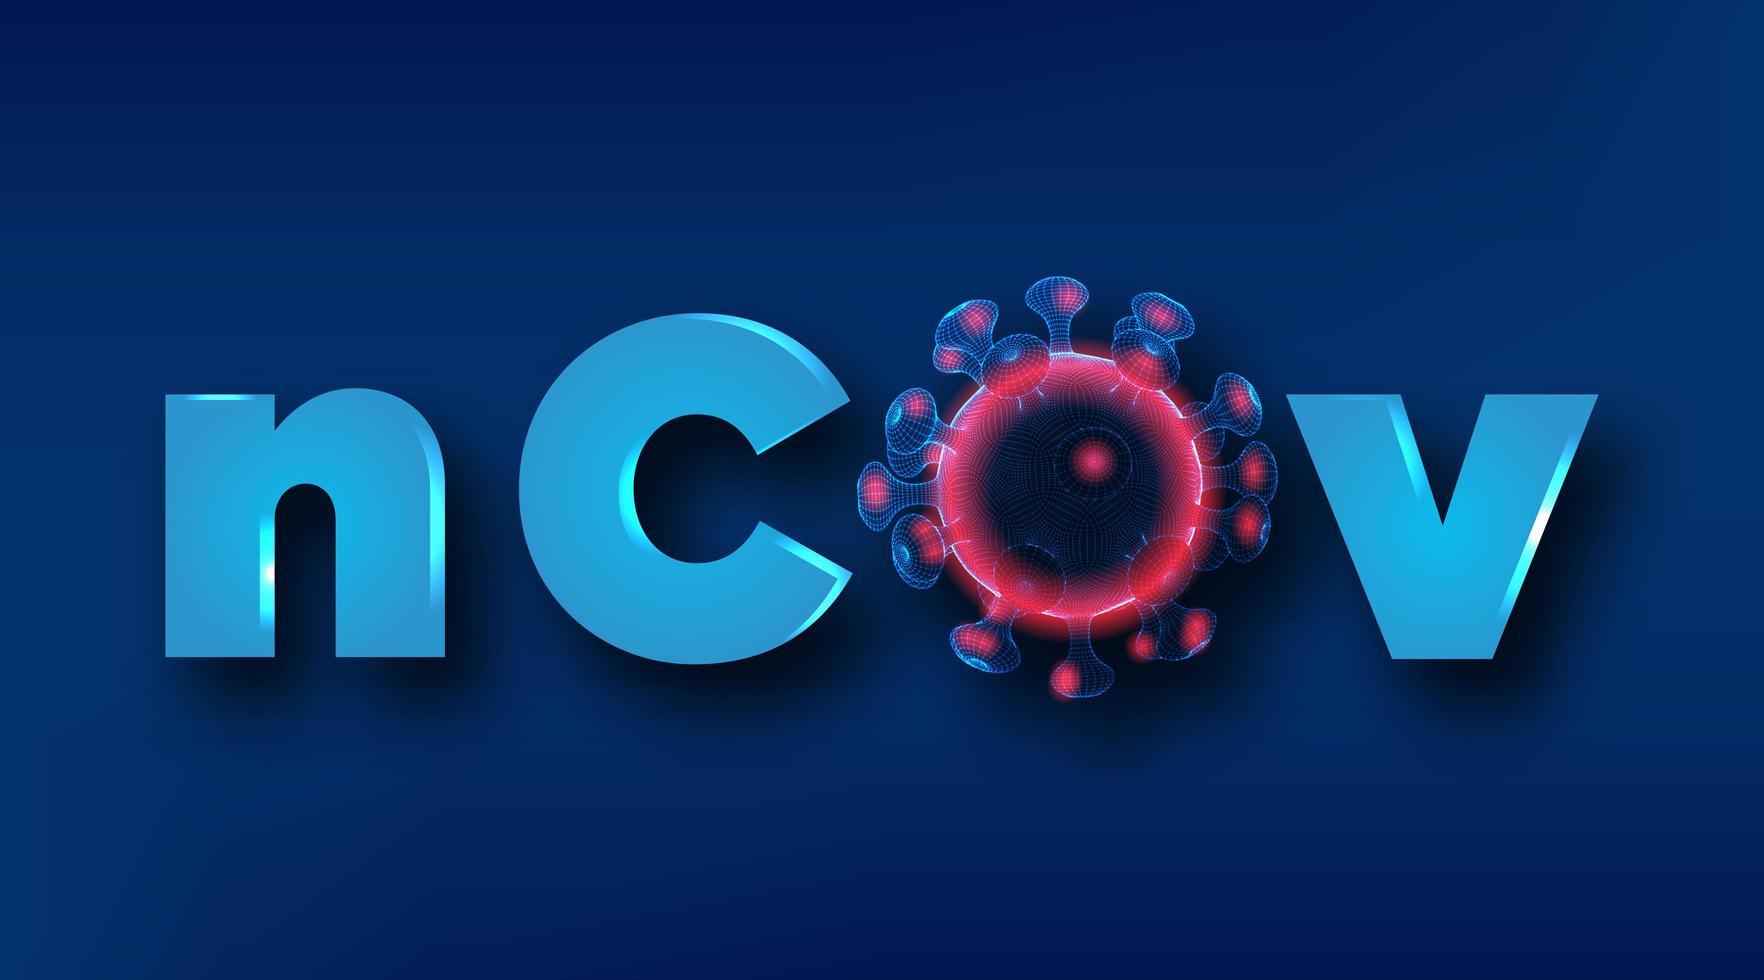 Coronavirus Wireframe Virus with nCov Text vector